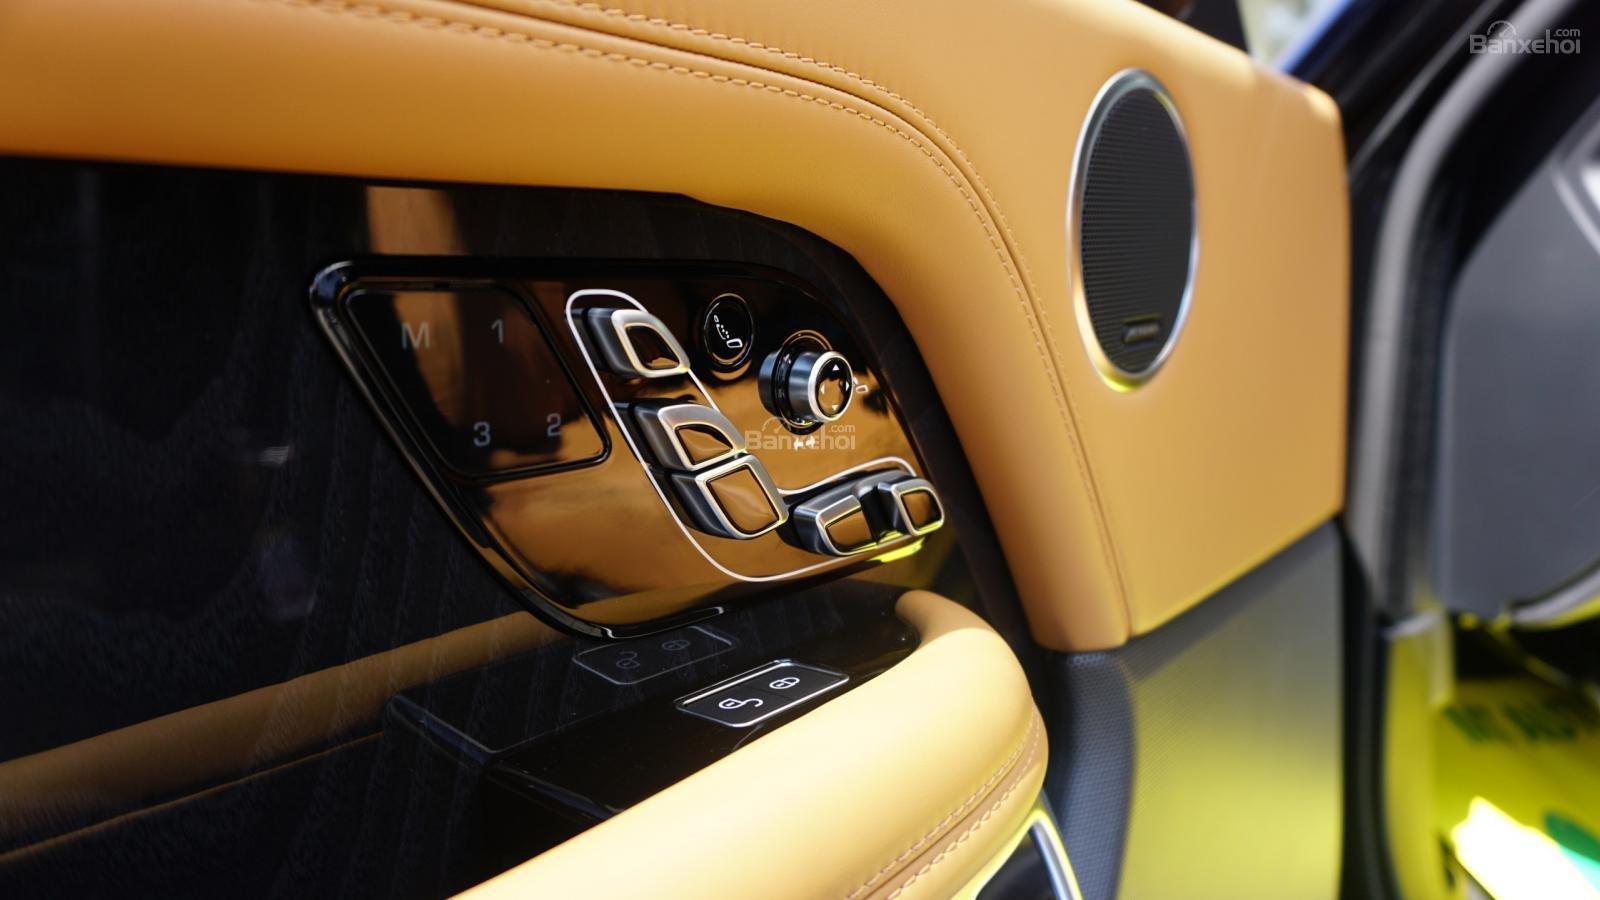 Cần bán LandRover Range Rover Autobio LWB 5.0 2018, màu đen, xe nhập-6